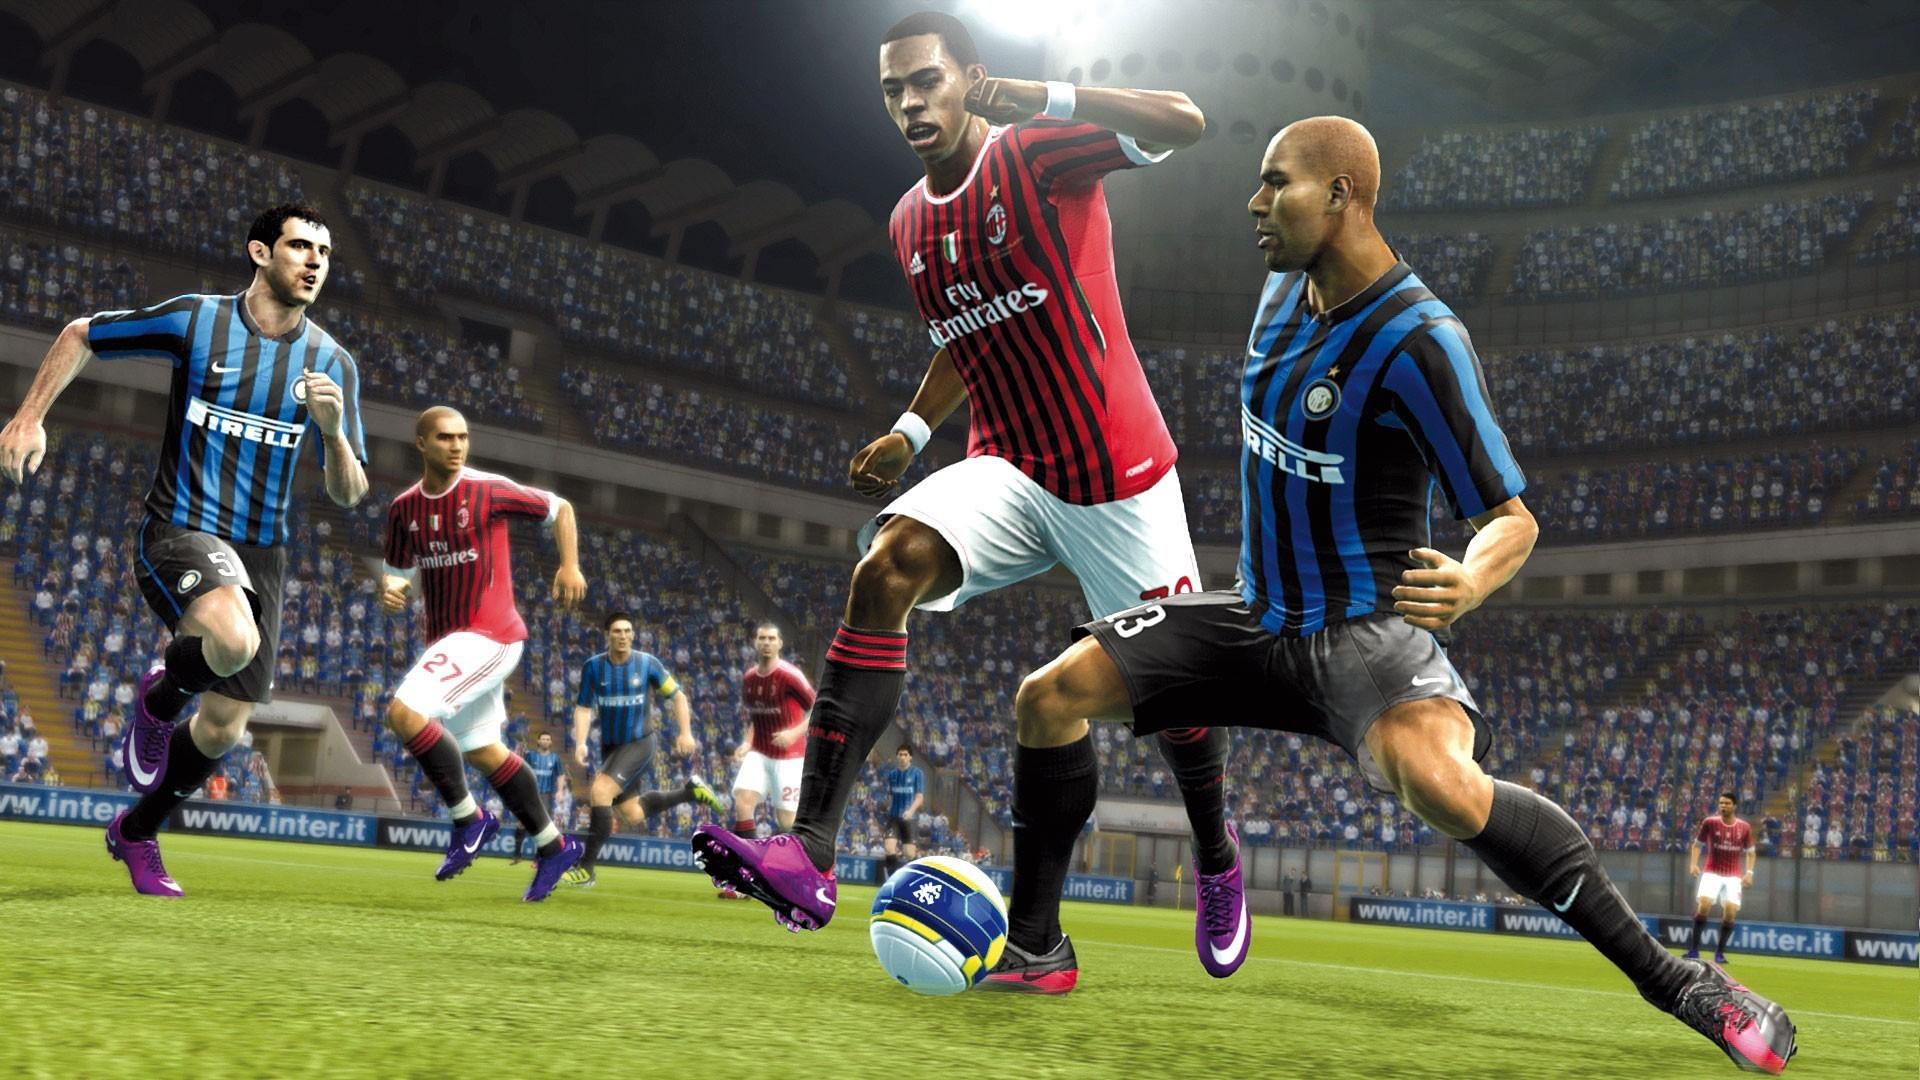 FIFA, Inter Milan, AC Milan Wallpapers HD / Desktop and Mobile Backgrounds